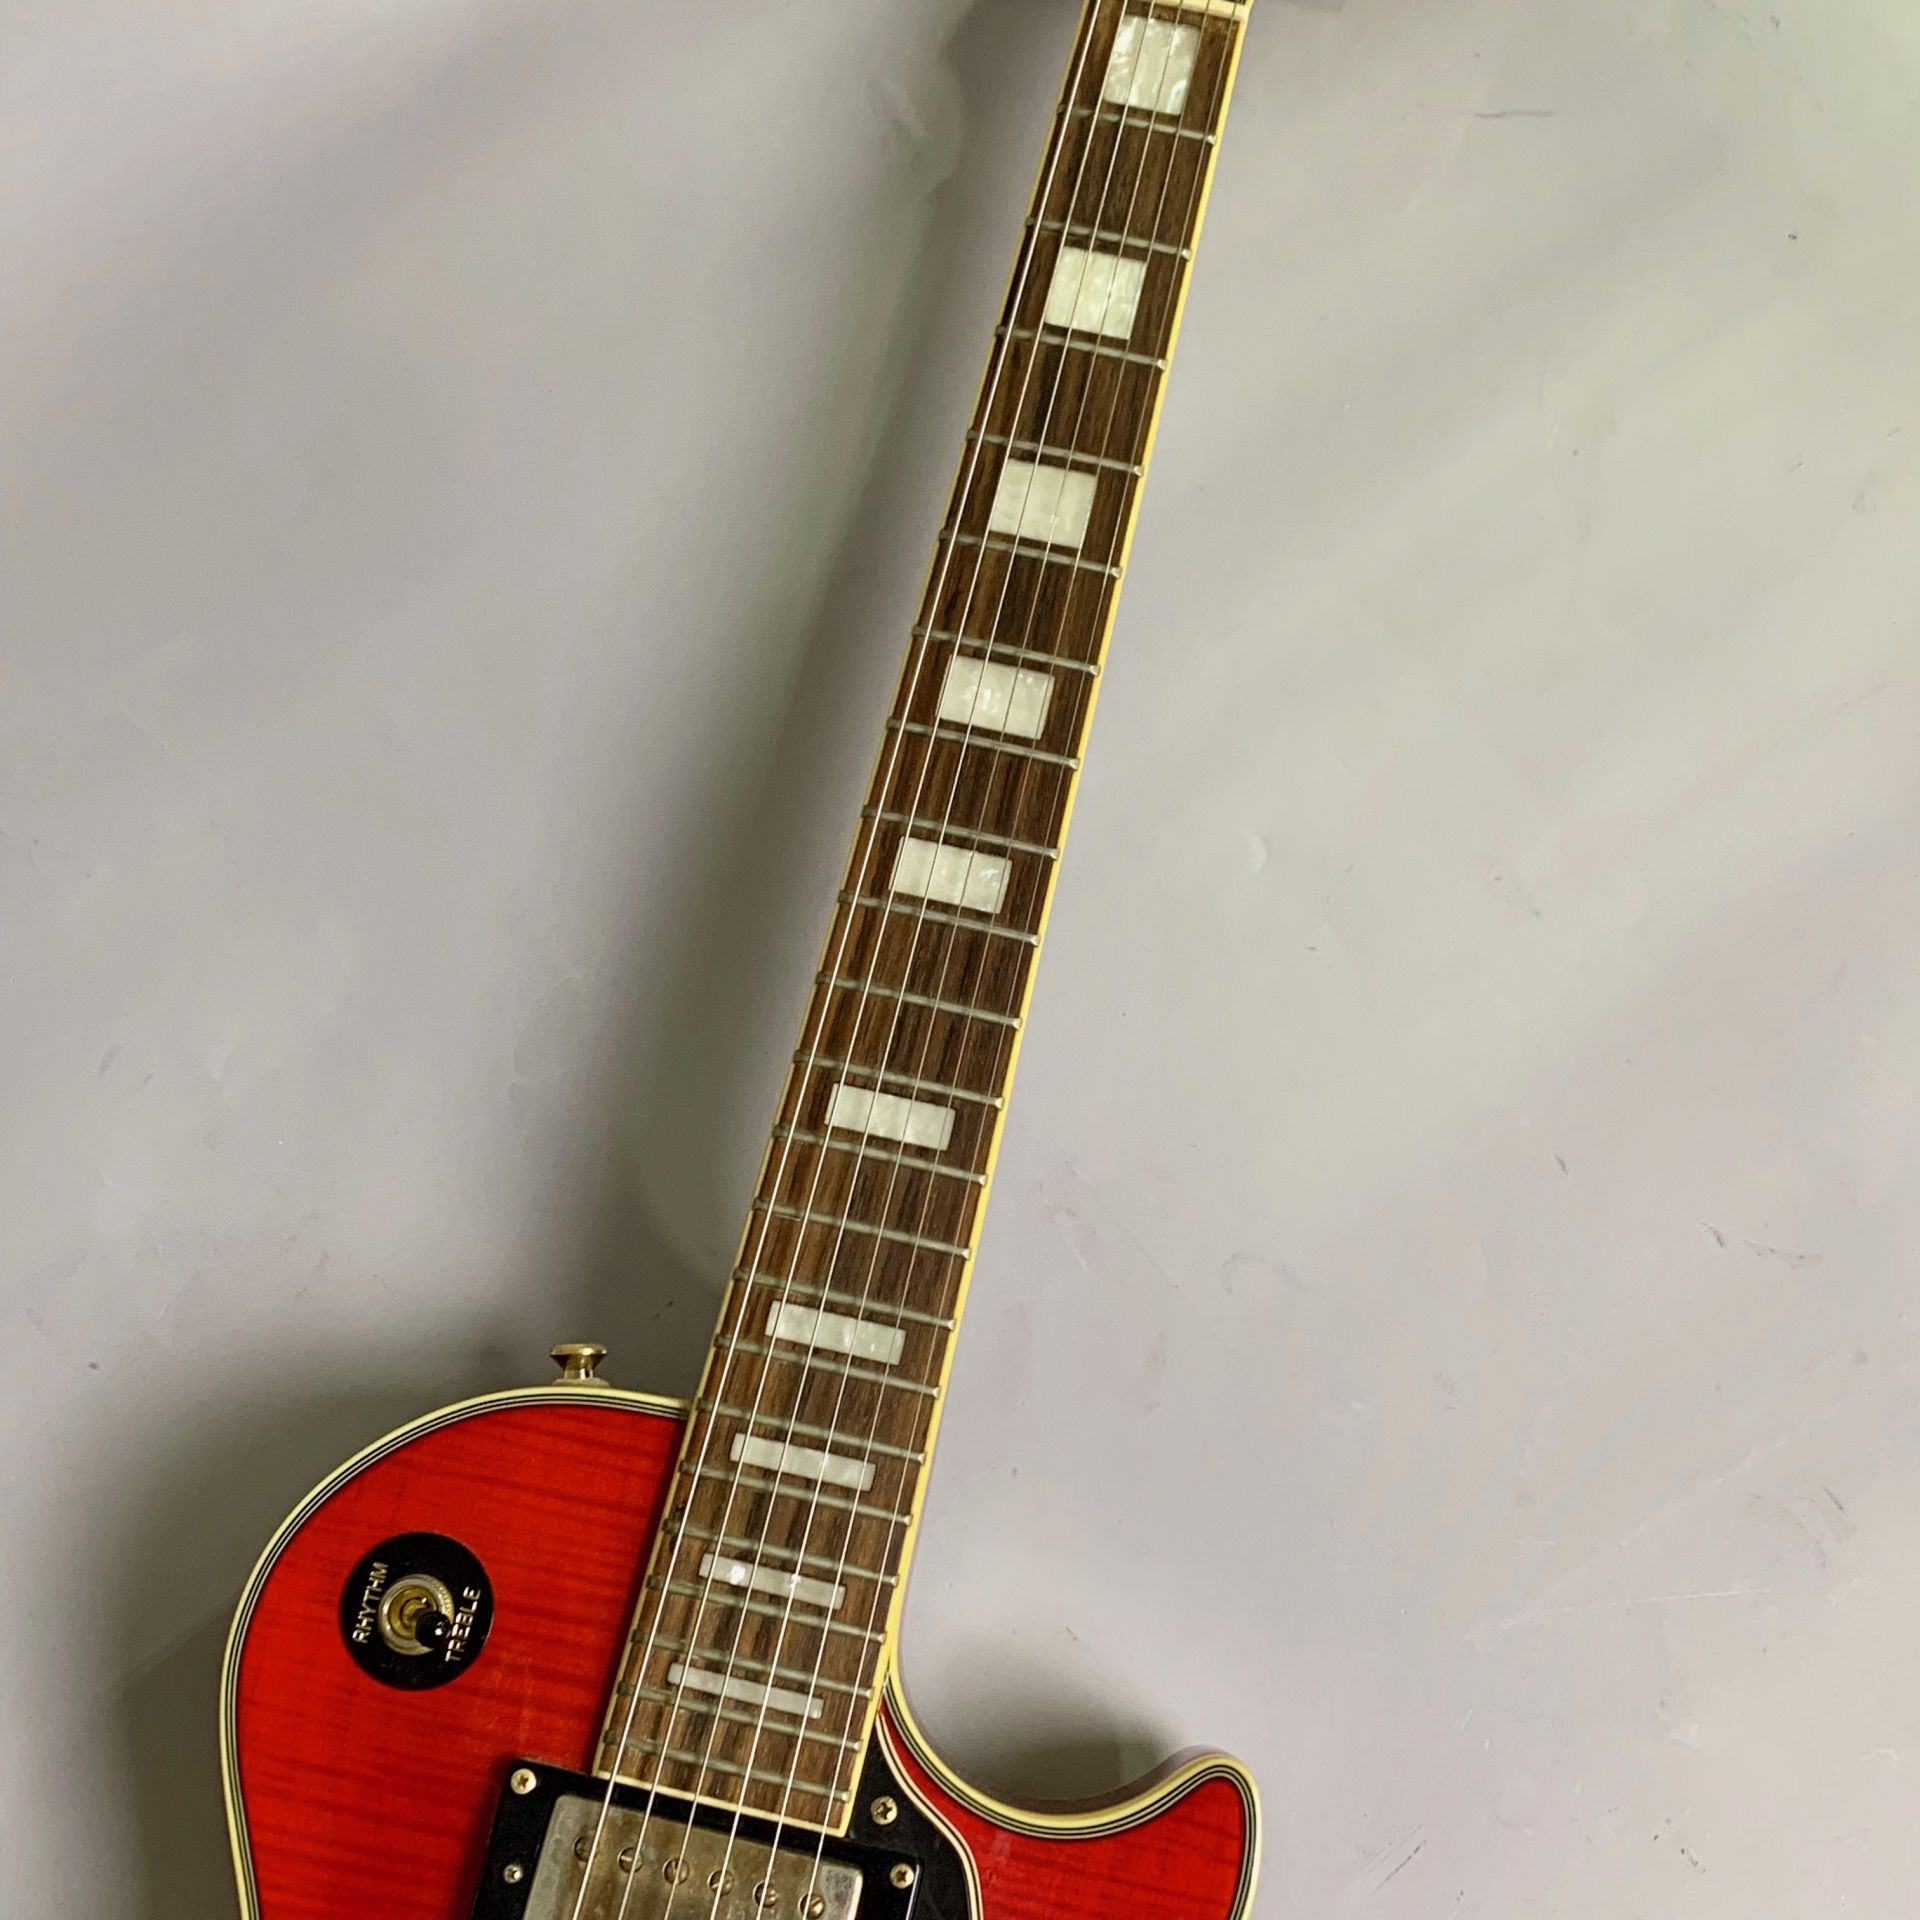 Les Paul Custom Plus Top Herritage Cherry Sunburst【2nd品】のボディバック-アップ画像